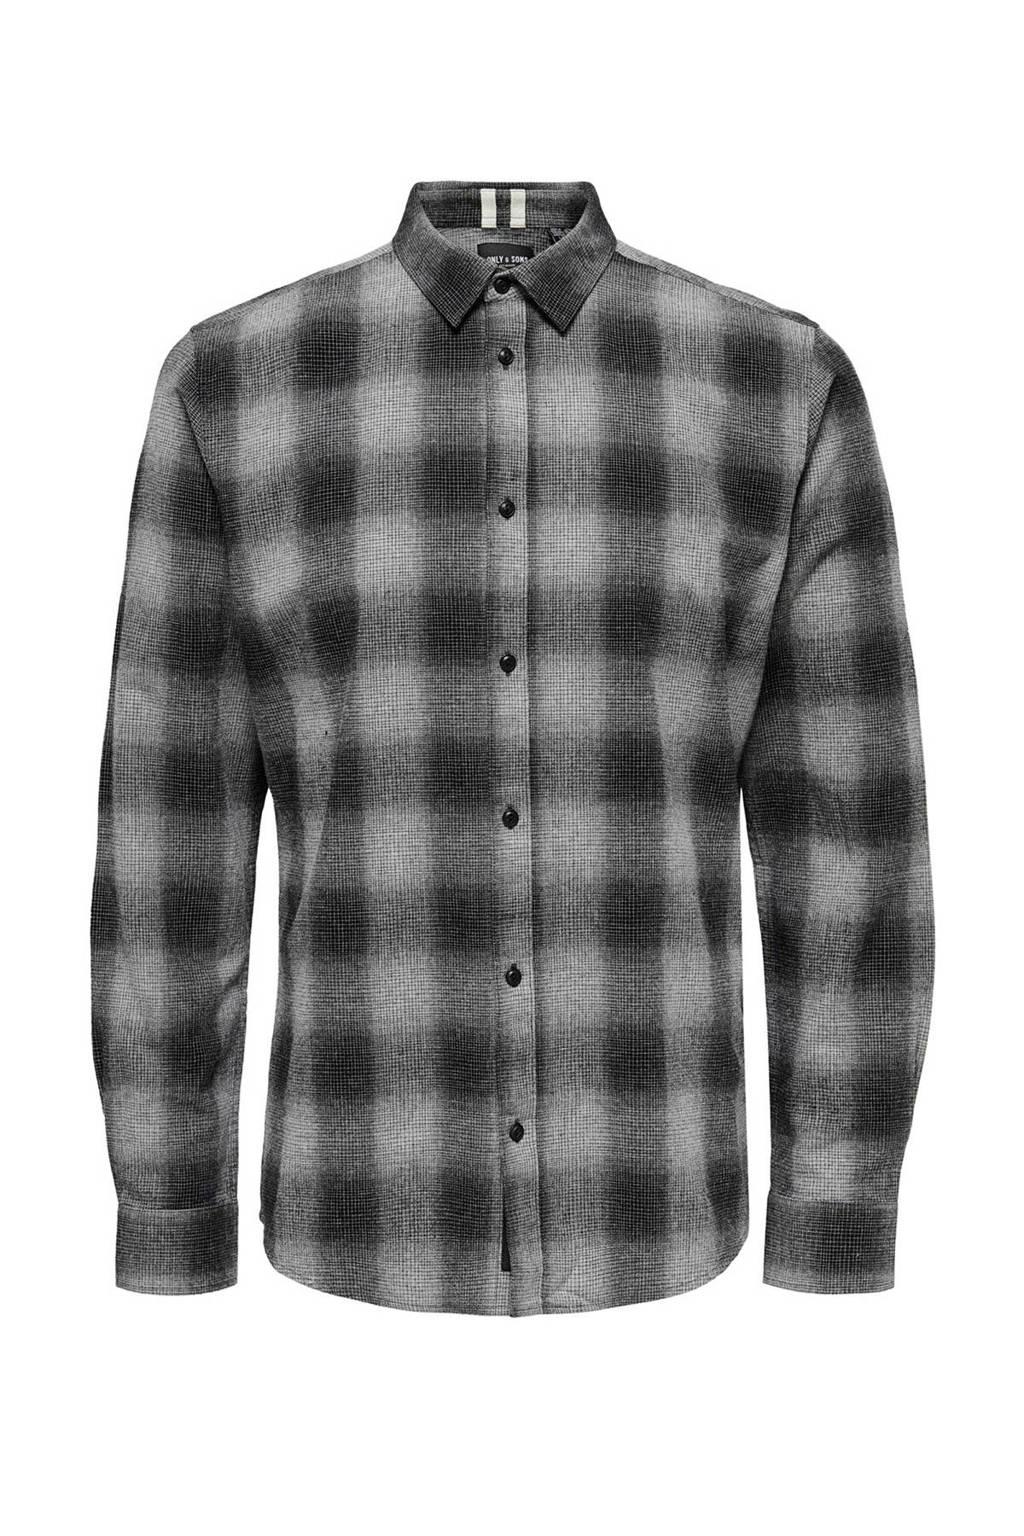 ONLY & SONS PLUS geruit regular fit overhemd grijs/wit, Grijs/wit